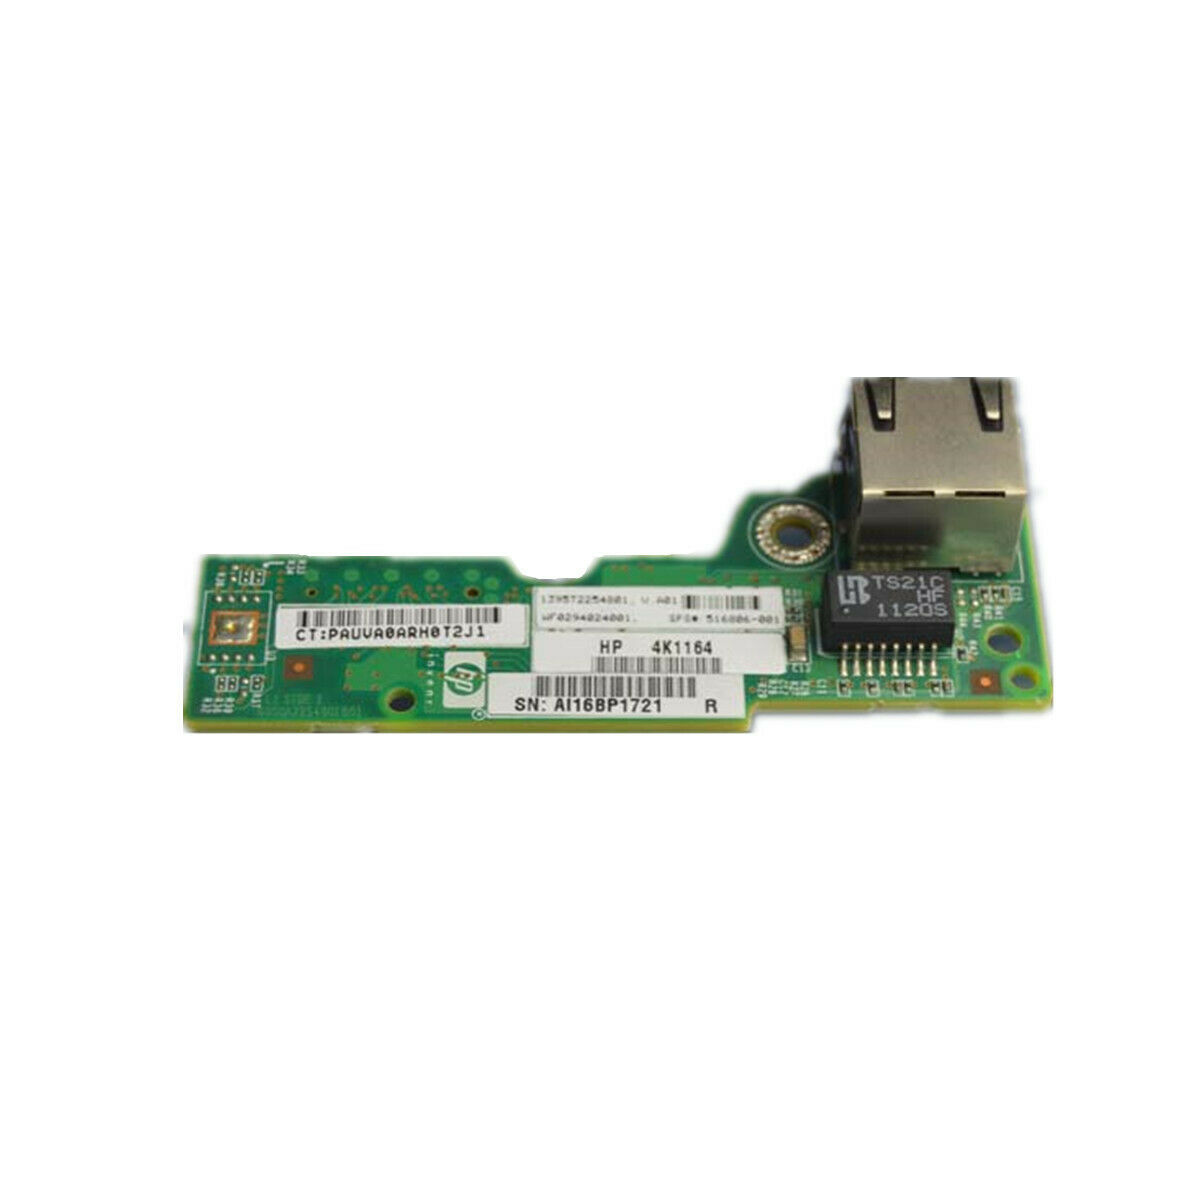 5 PCS of 516806-001 HP Proliant DL180 G6 Lights-Out LO-100i Management Port  Boad